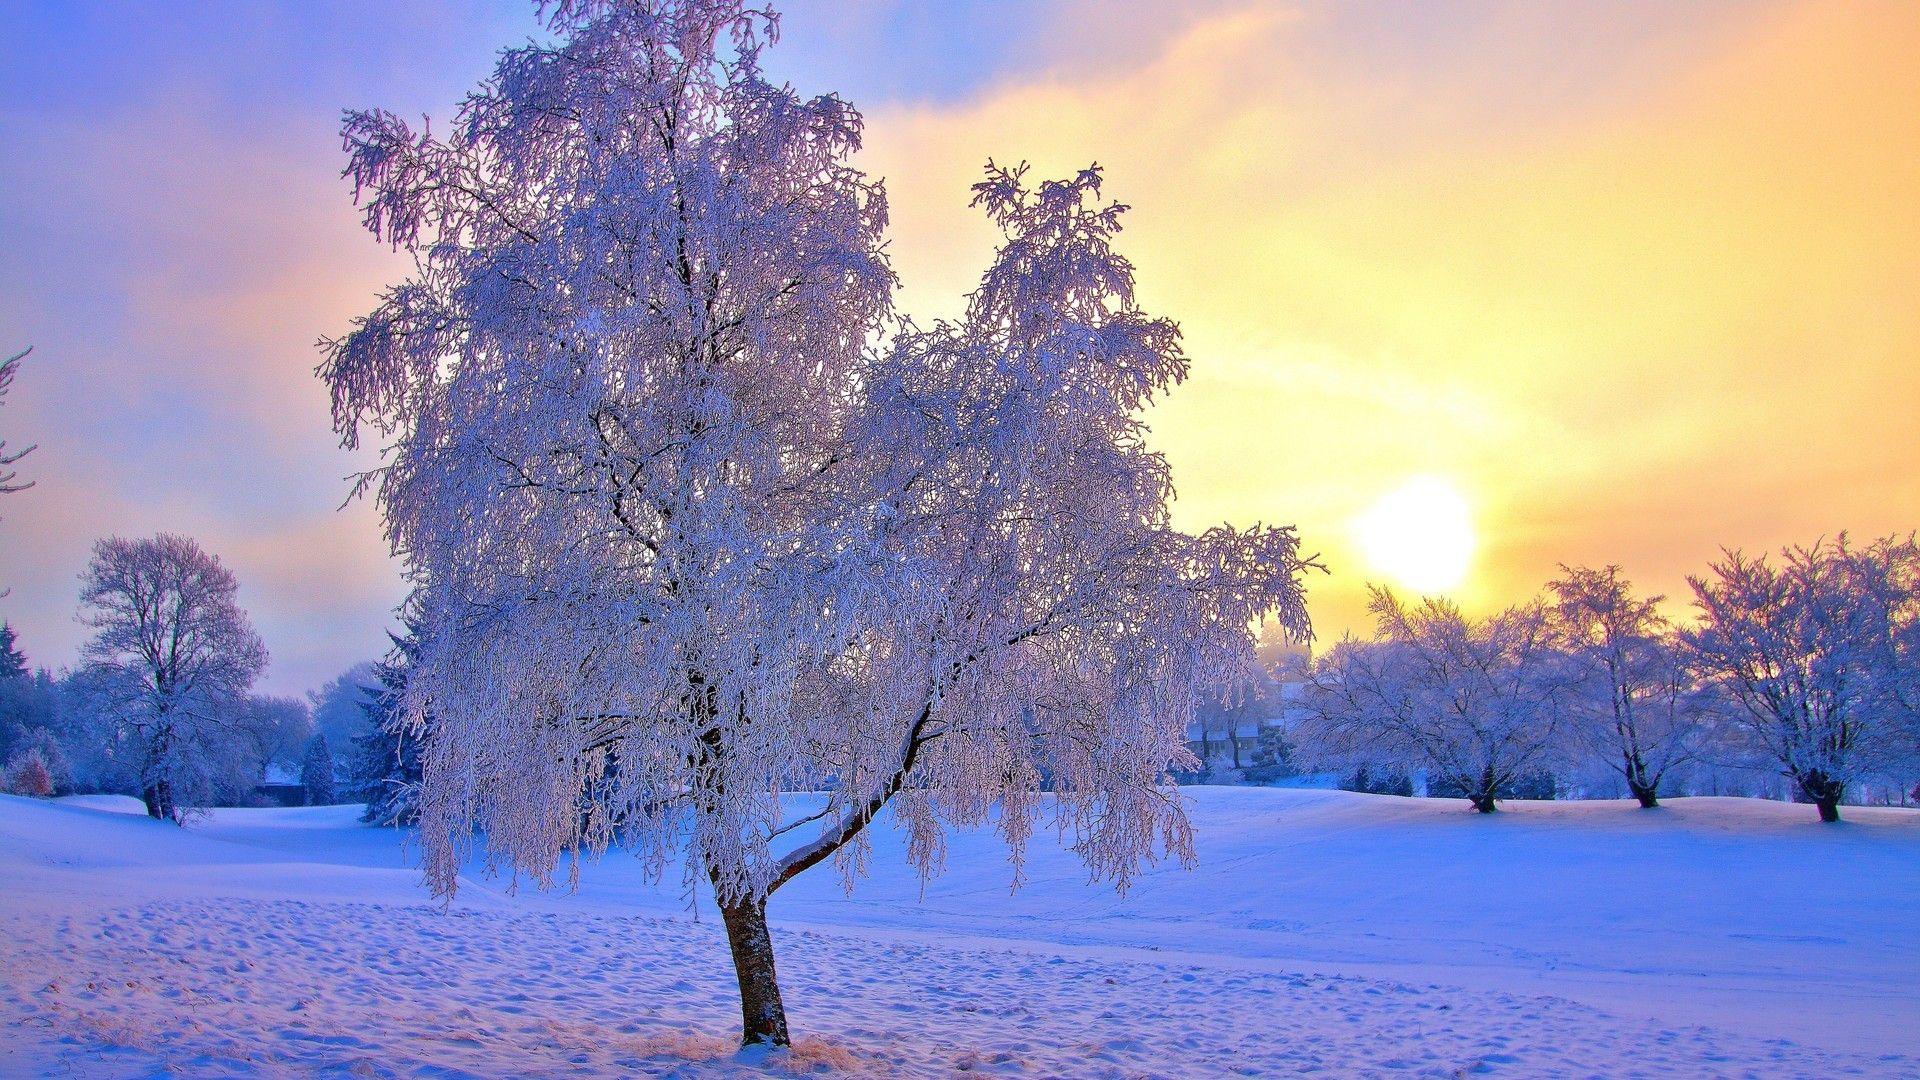 Fond ecran paysage arbre givr hiver wallpaper hd tree ice for Fond ecran hiver hd